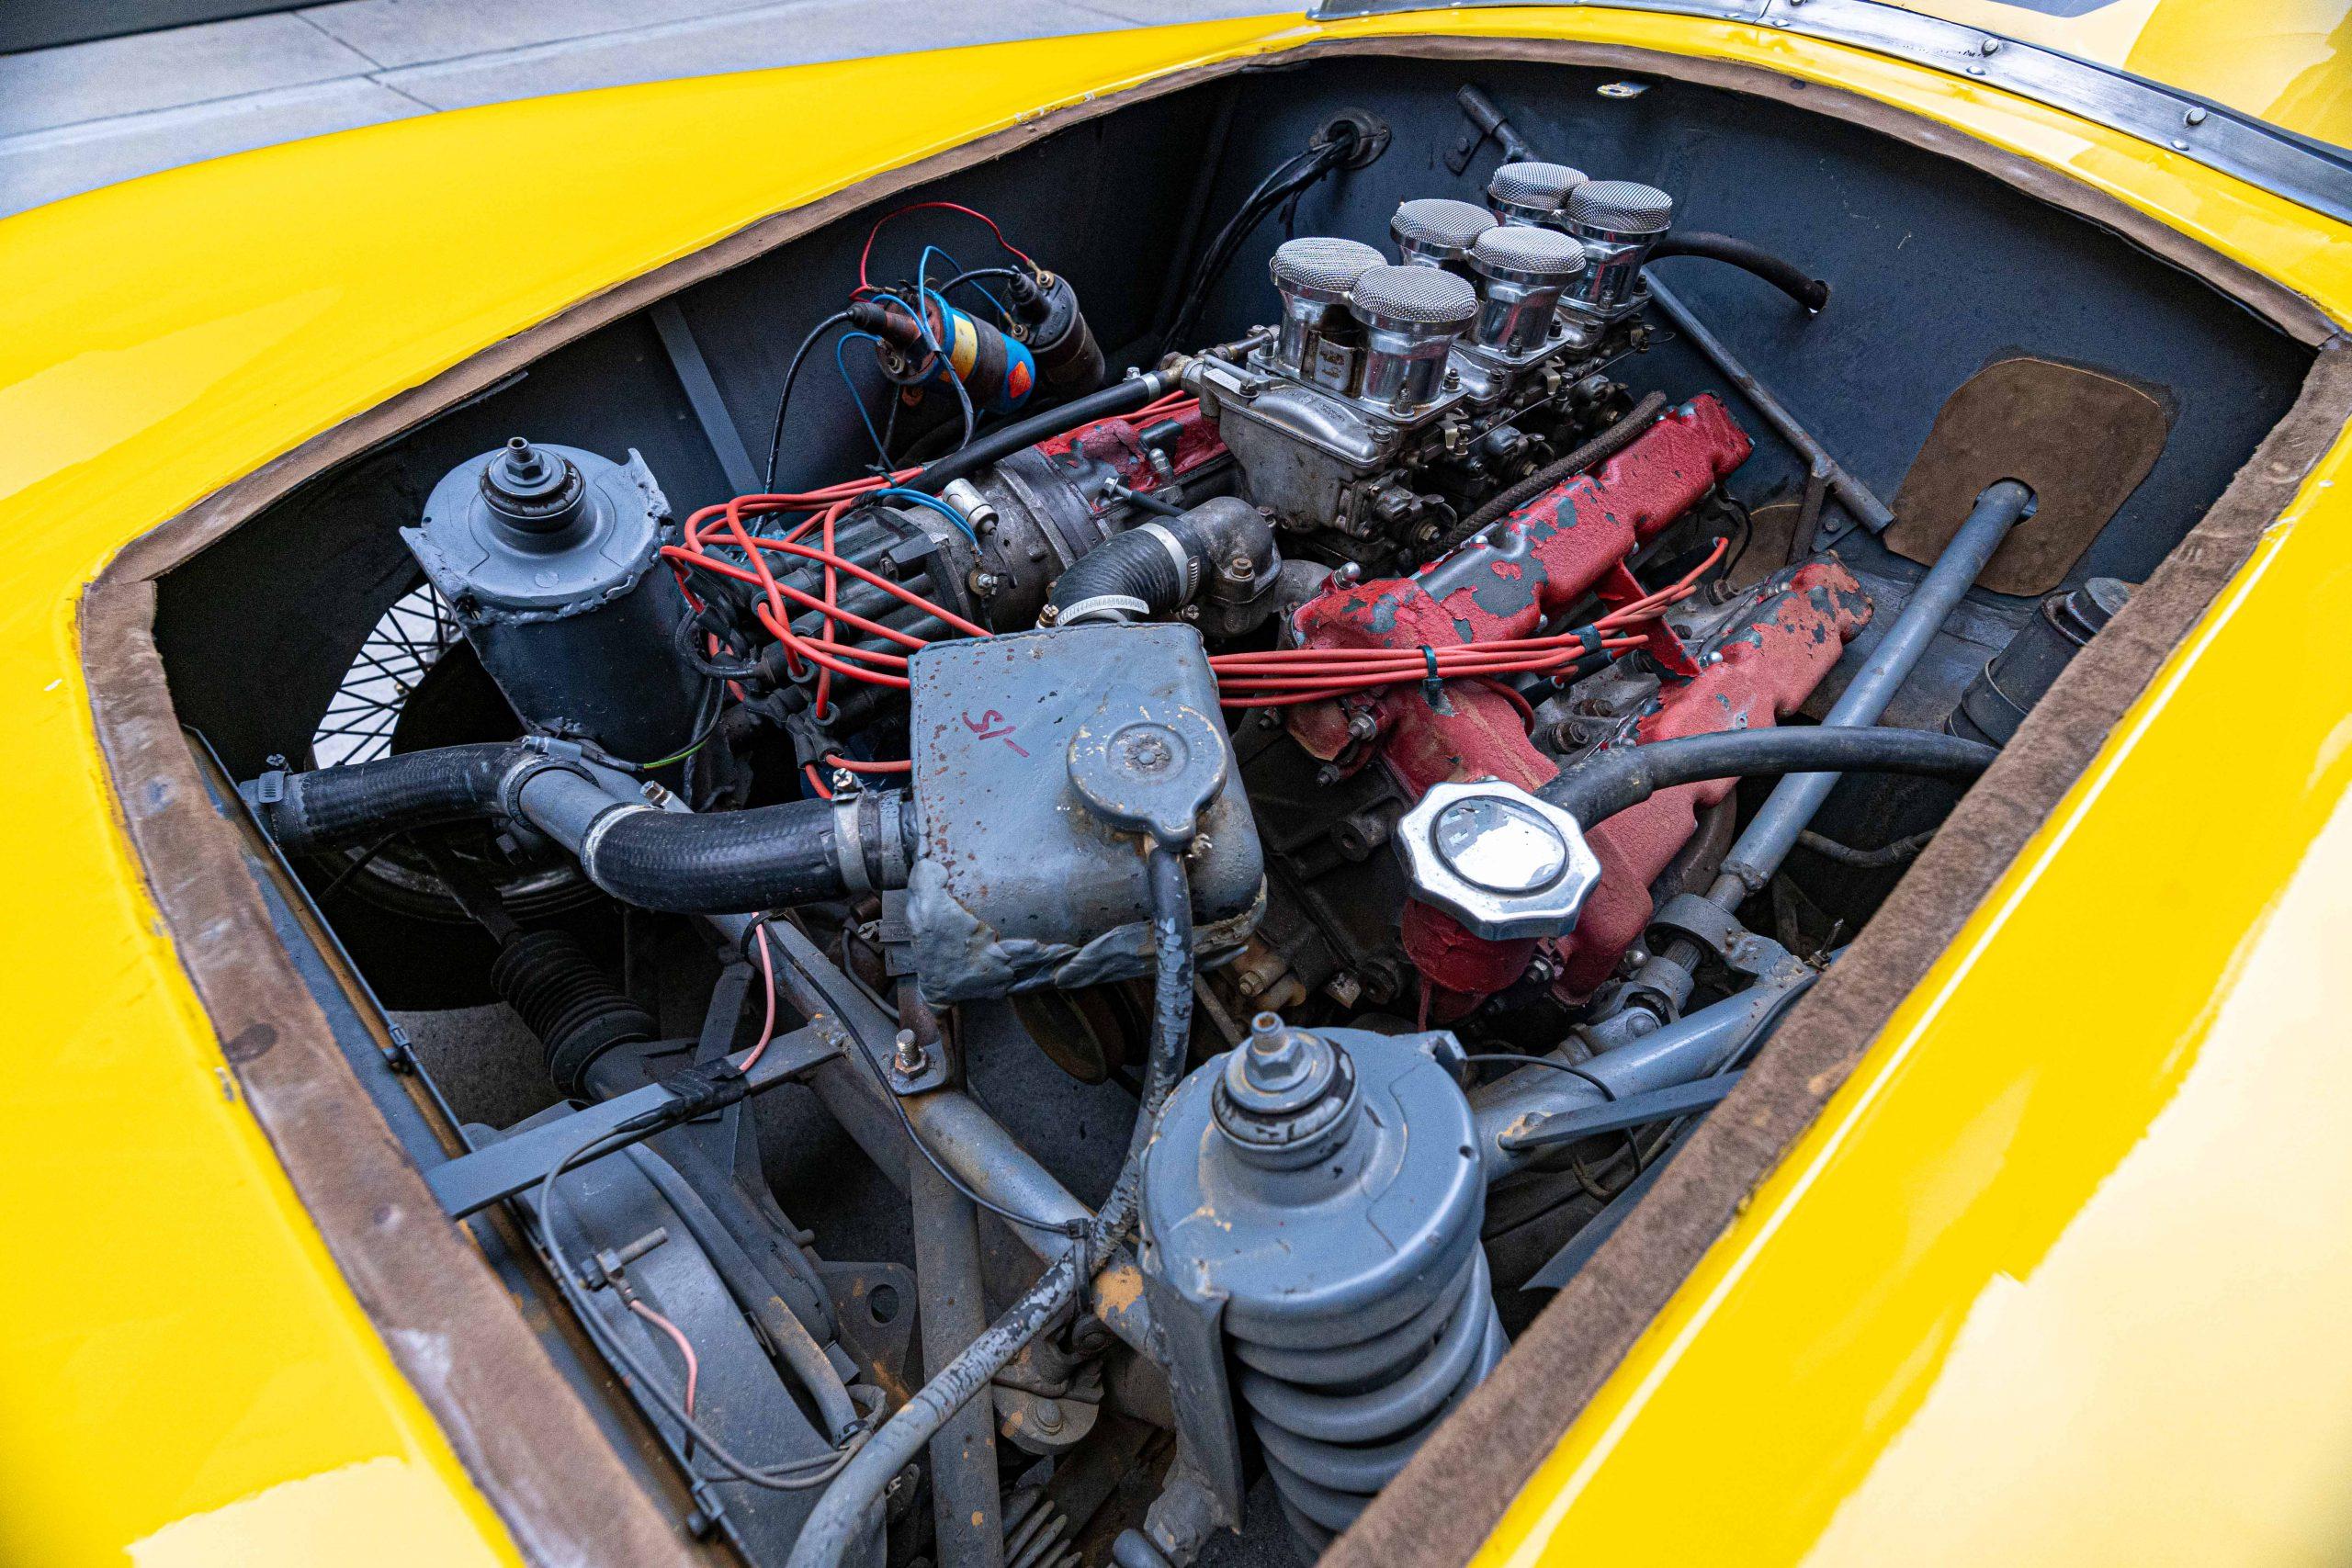 1957 Ferrari 196 SP Engine driver front view